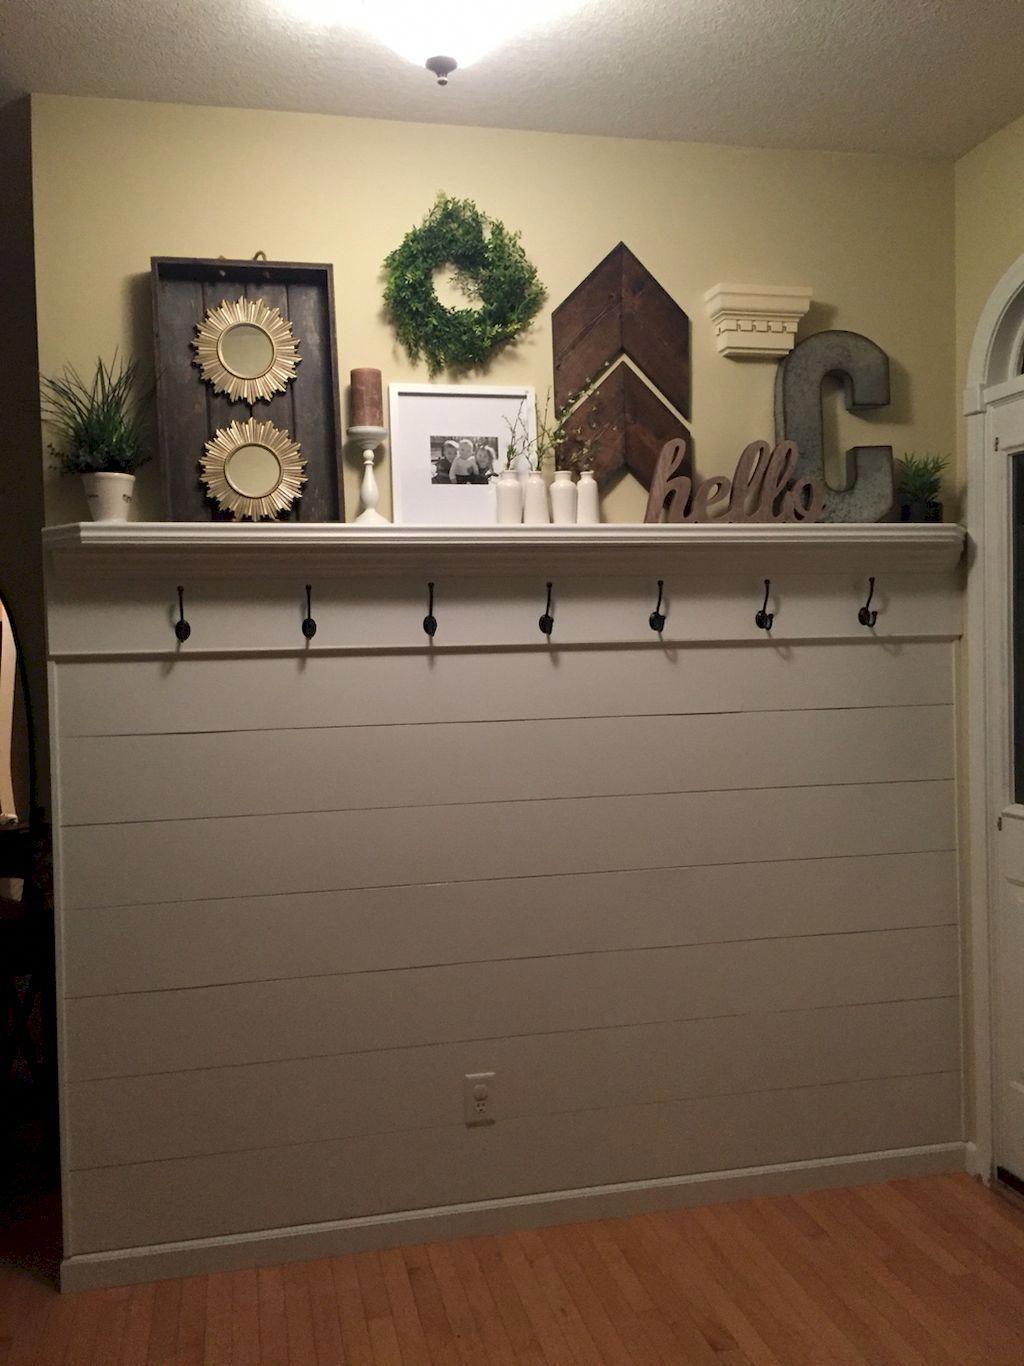 Home Decor Ideas Pinterest Living Room For Christmas I Mudroom Foyer Decorating Farmhouse